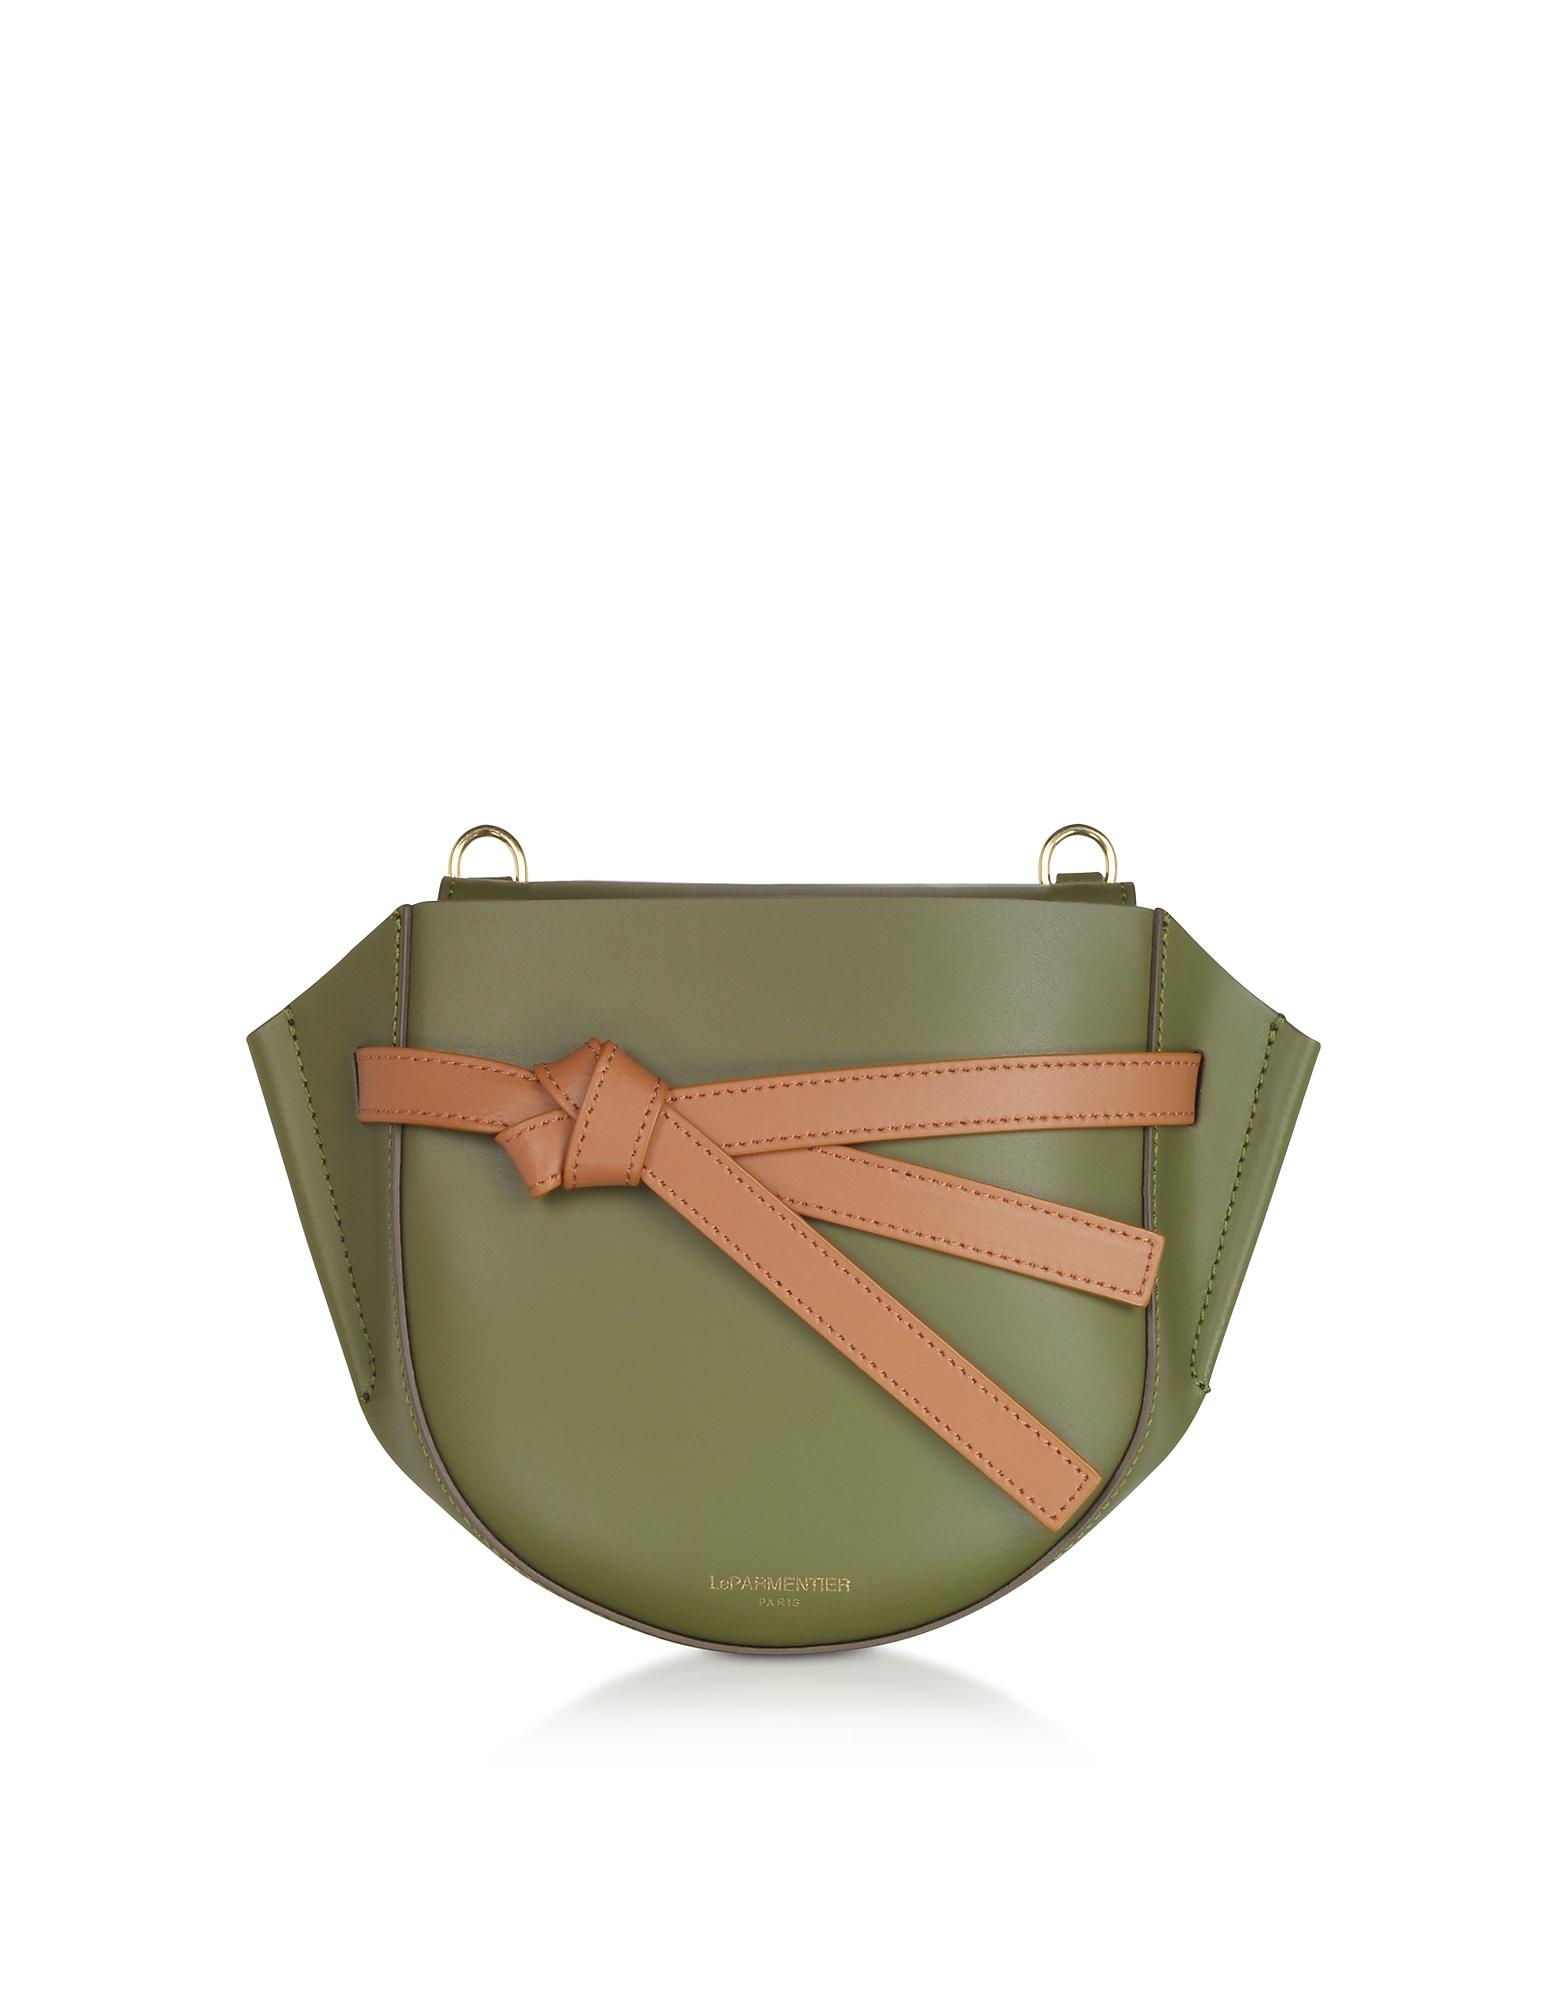 Le Parmentier  Handbags Peyote Smooth Leather Shoulder bag w/Bow